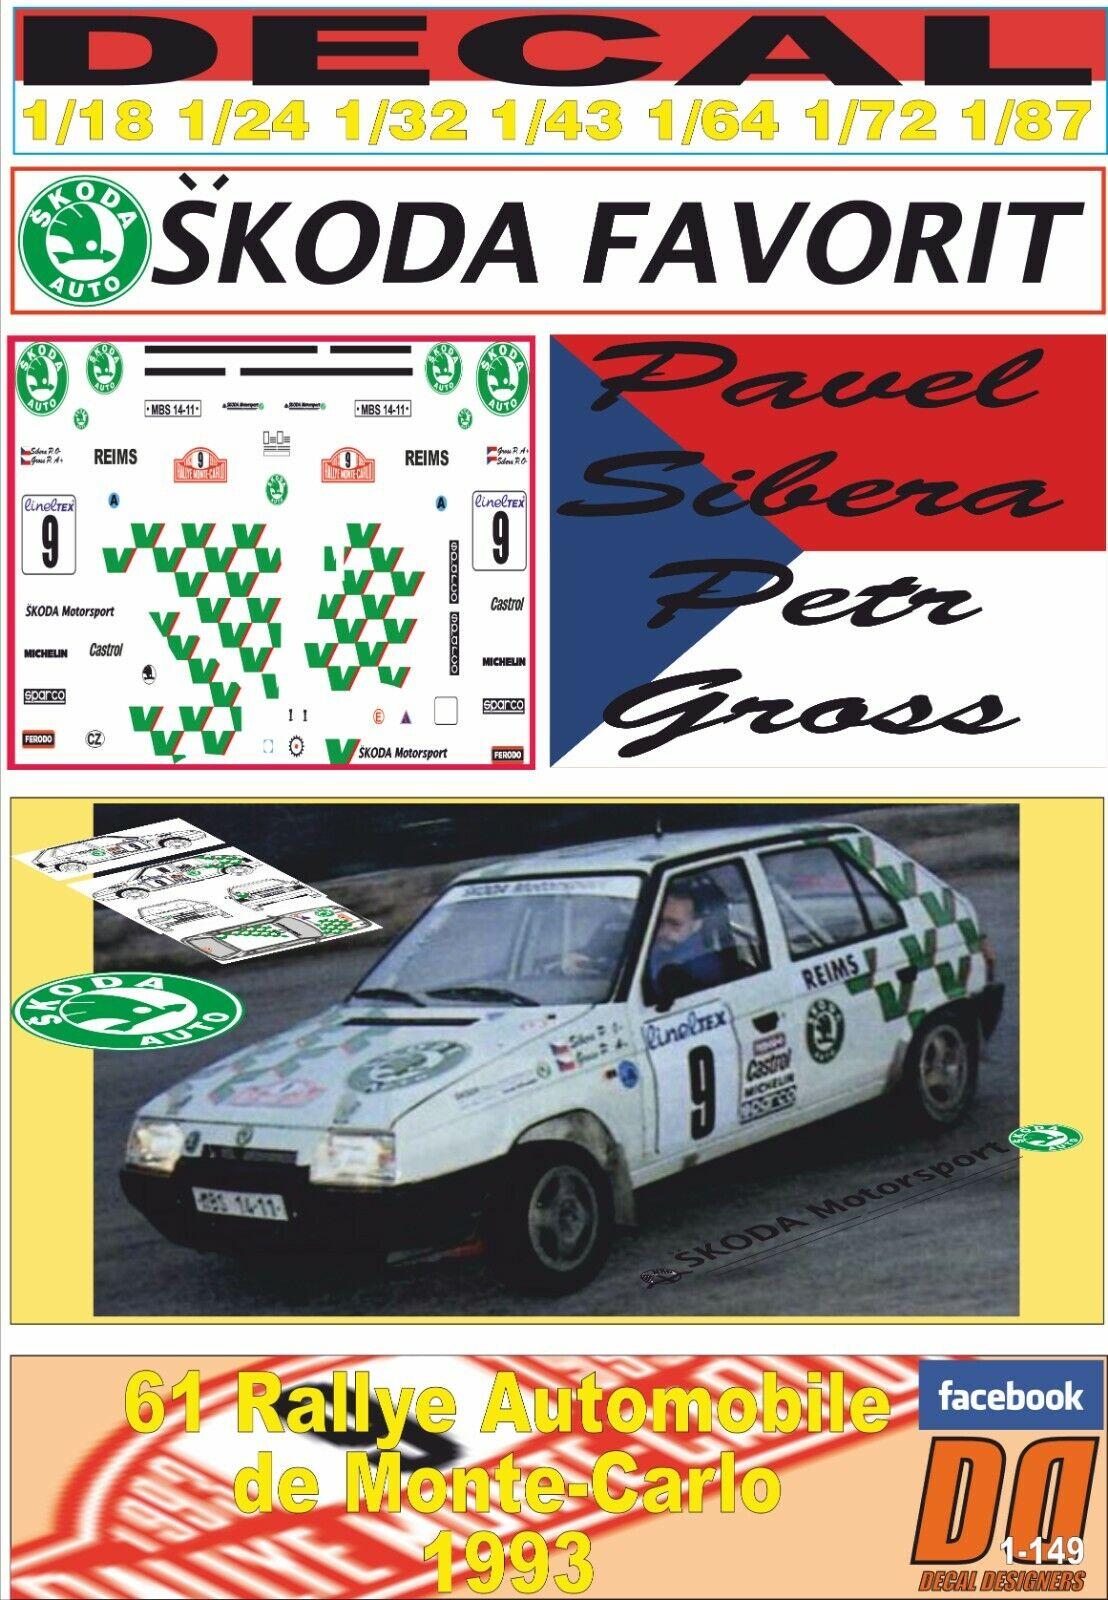 DECAL SKODA FAVORIT PAVEL SIBERA rally MONTEbilLO 1993 (08)